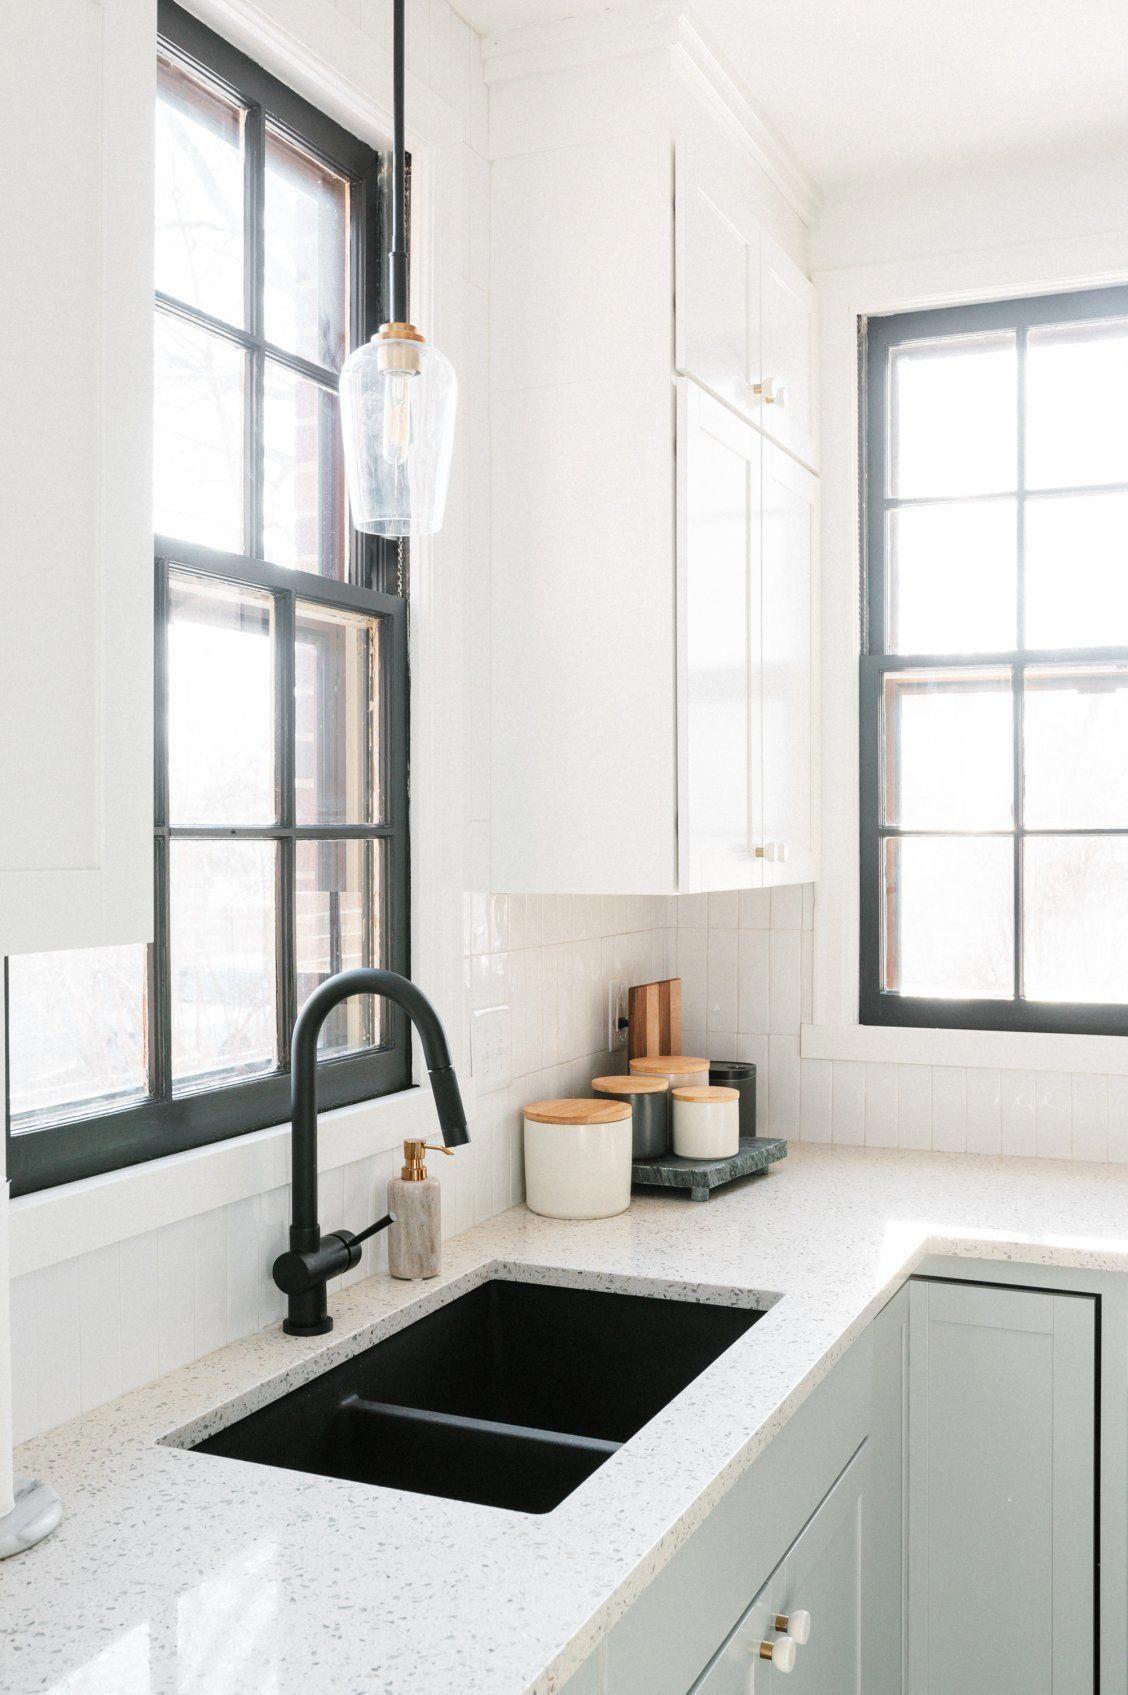 pin on kitchen sink faucet idea